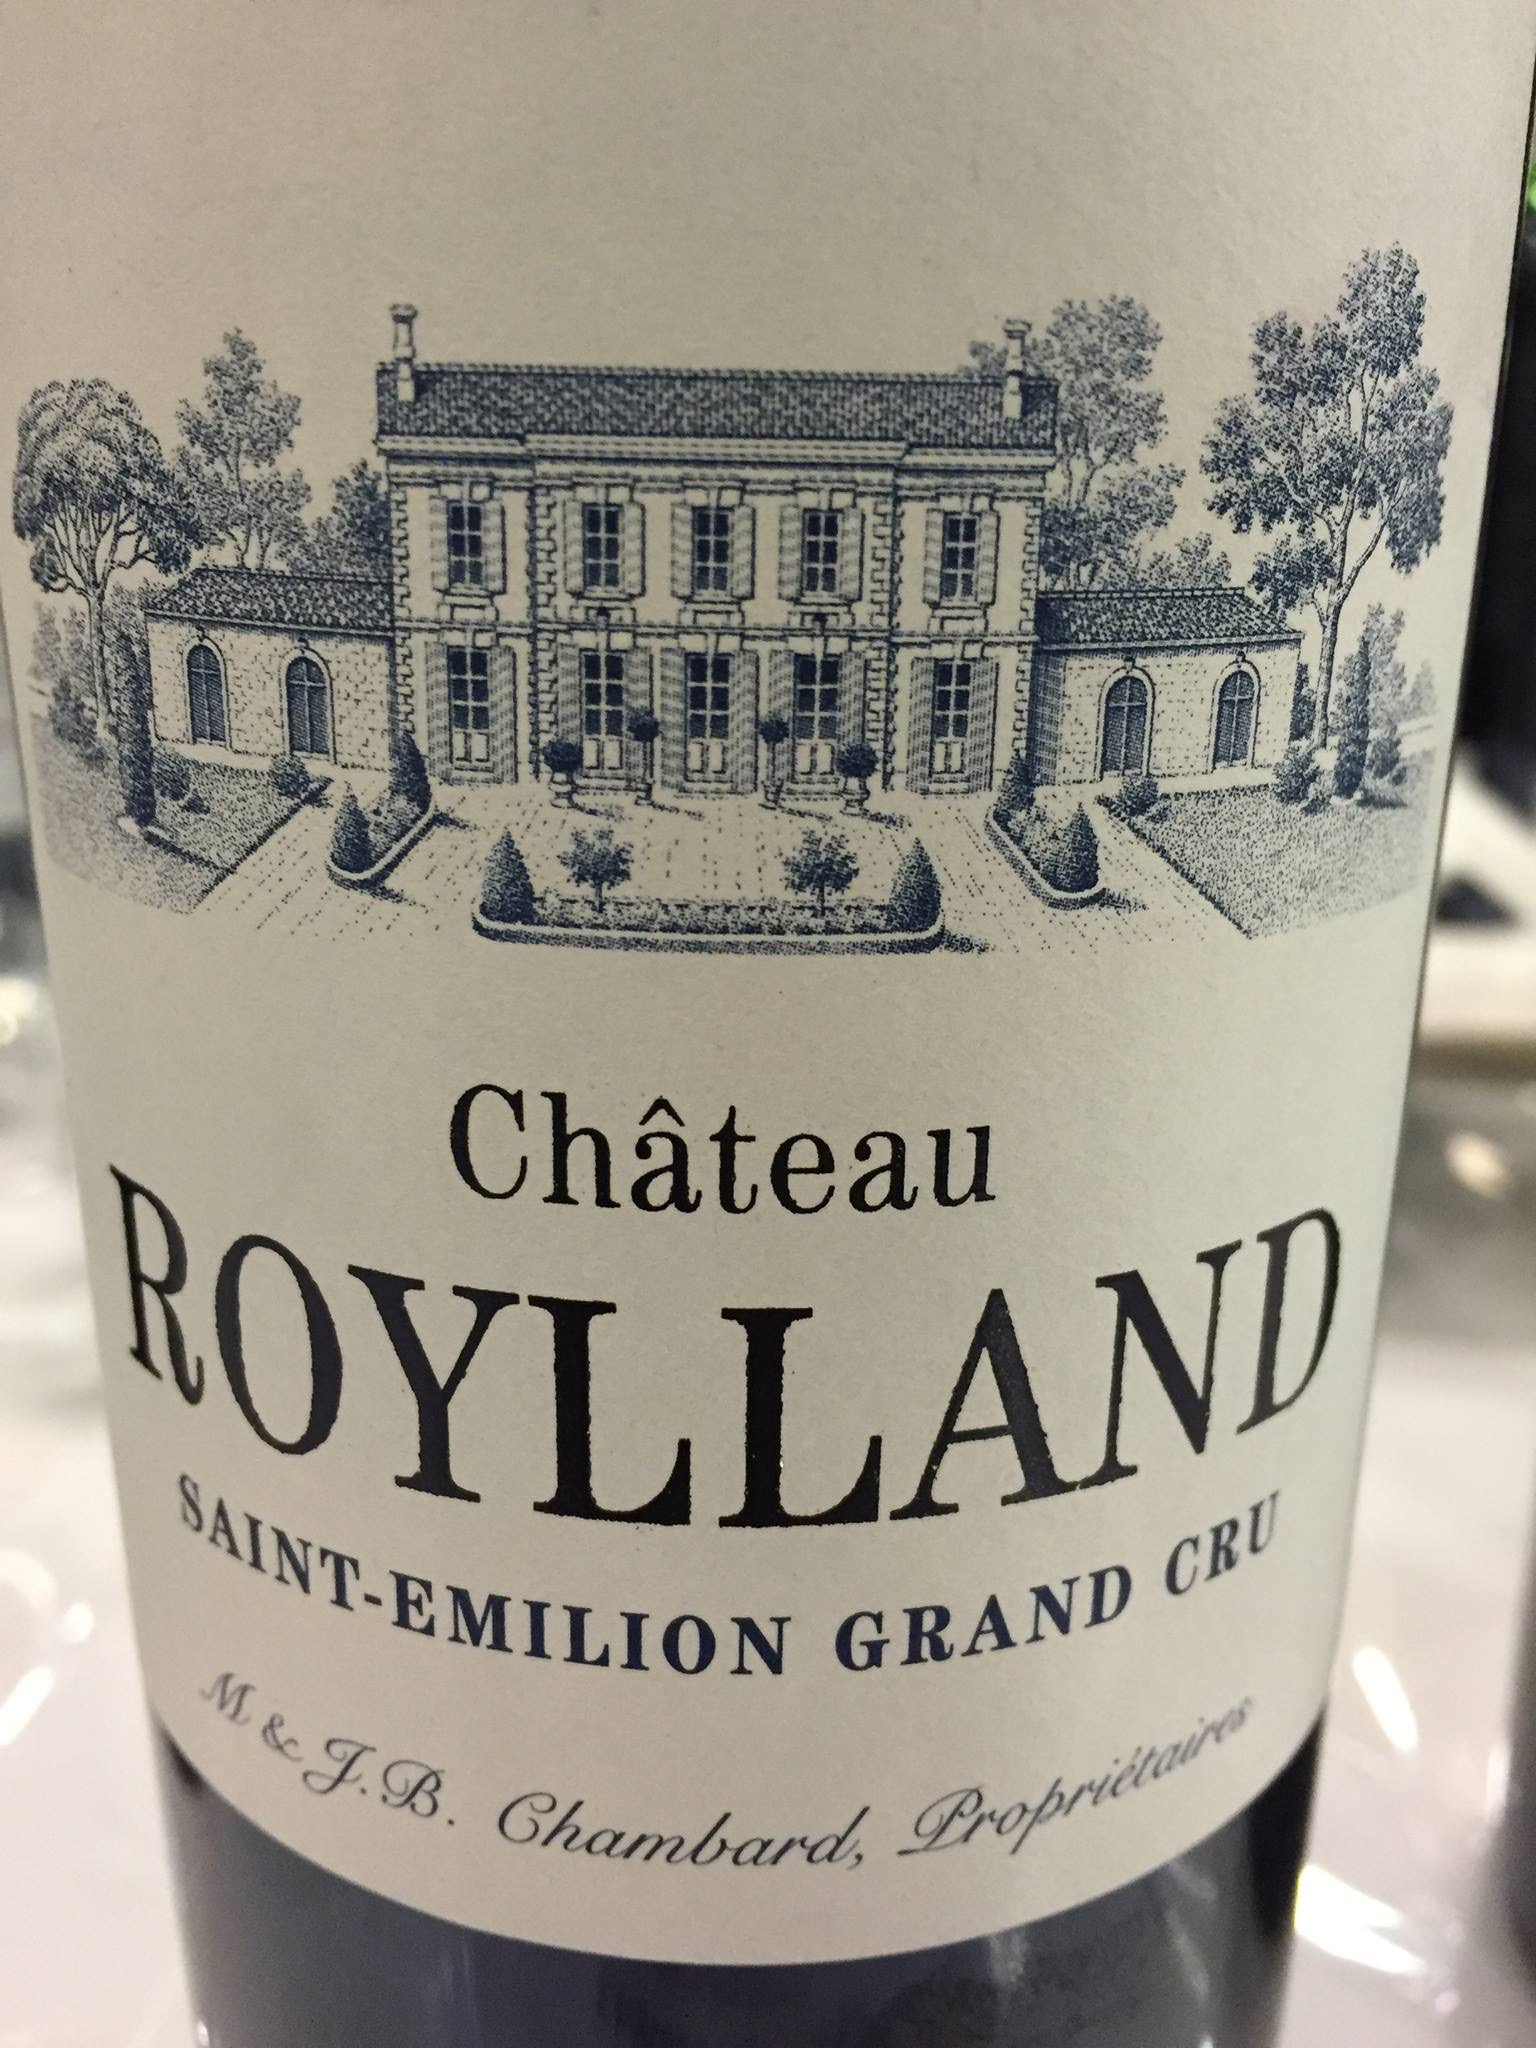 Château Roylland 2015 – Saint-Emilion Grand Cru